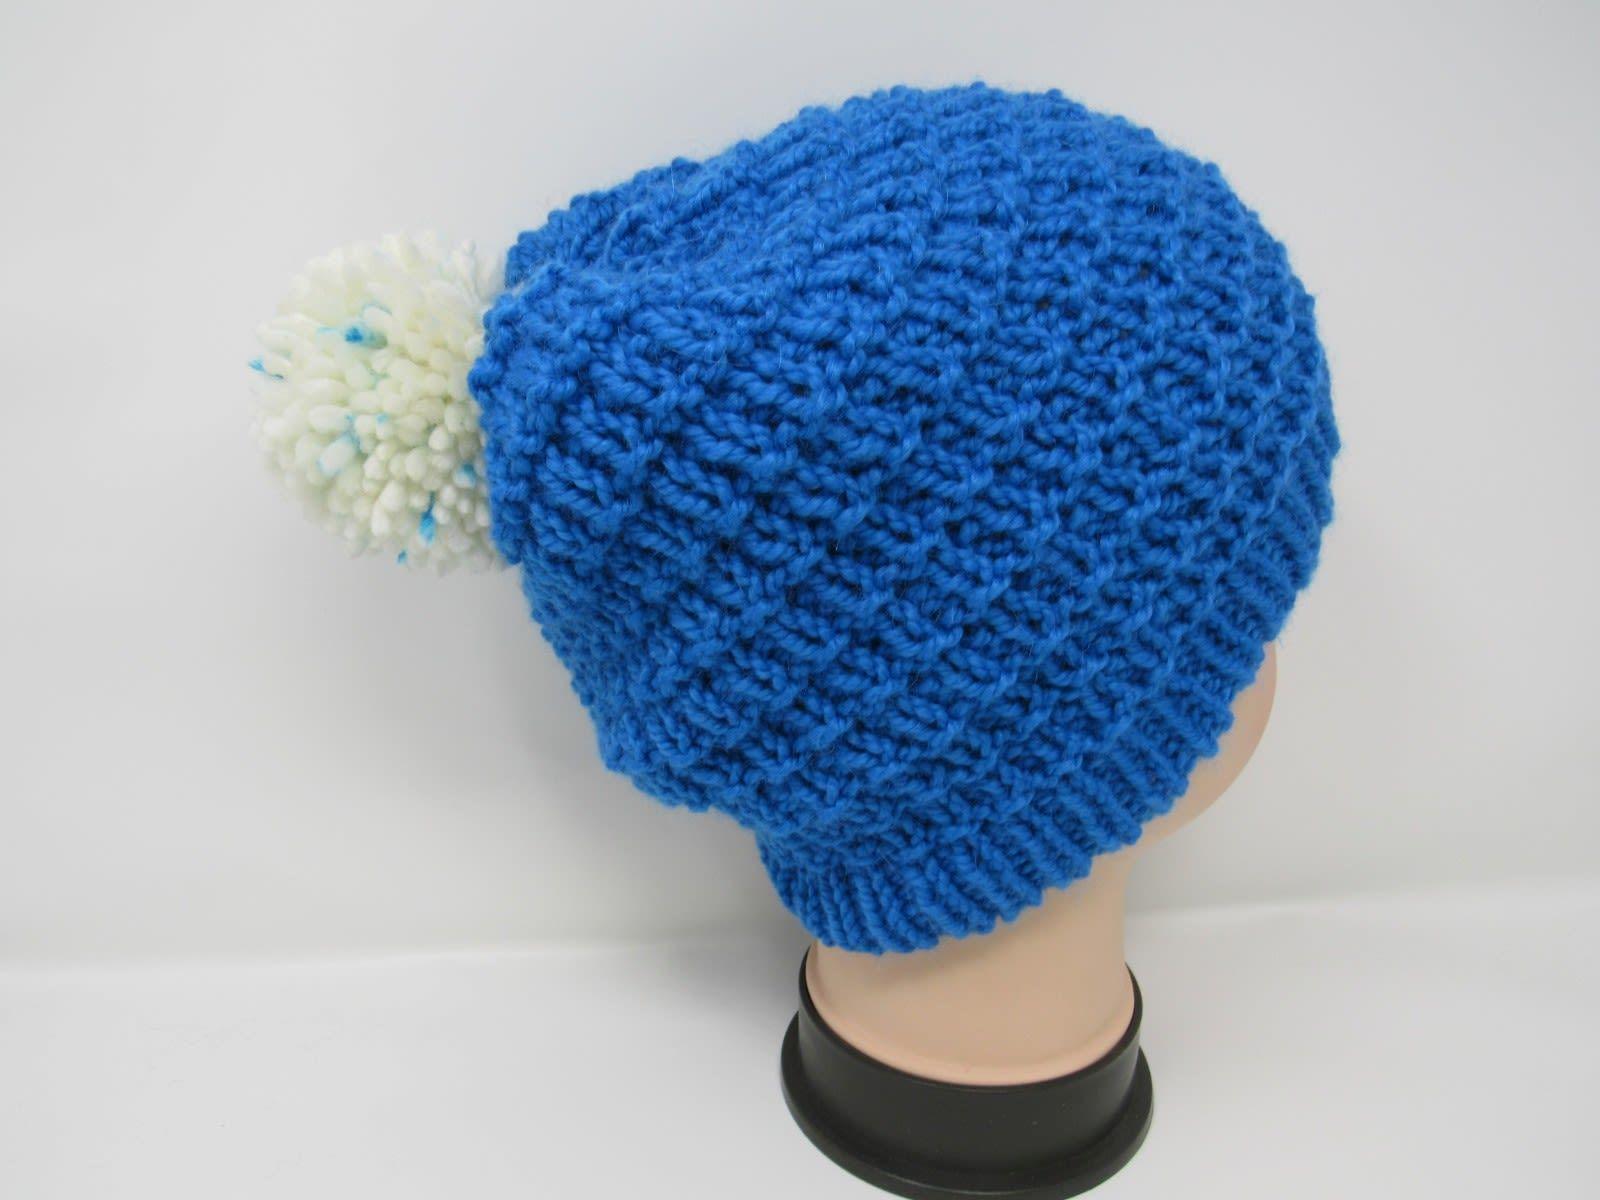 Handcrafted Knitted Hat Beanie Blue Alpaca/Merino Pom Pom Female Adult